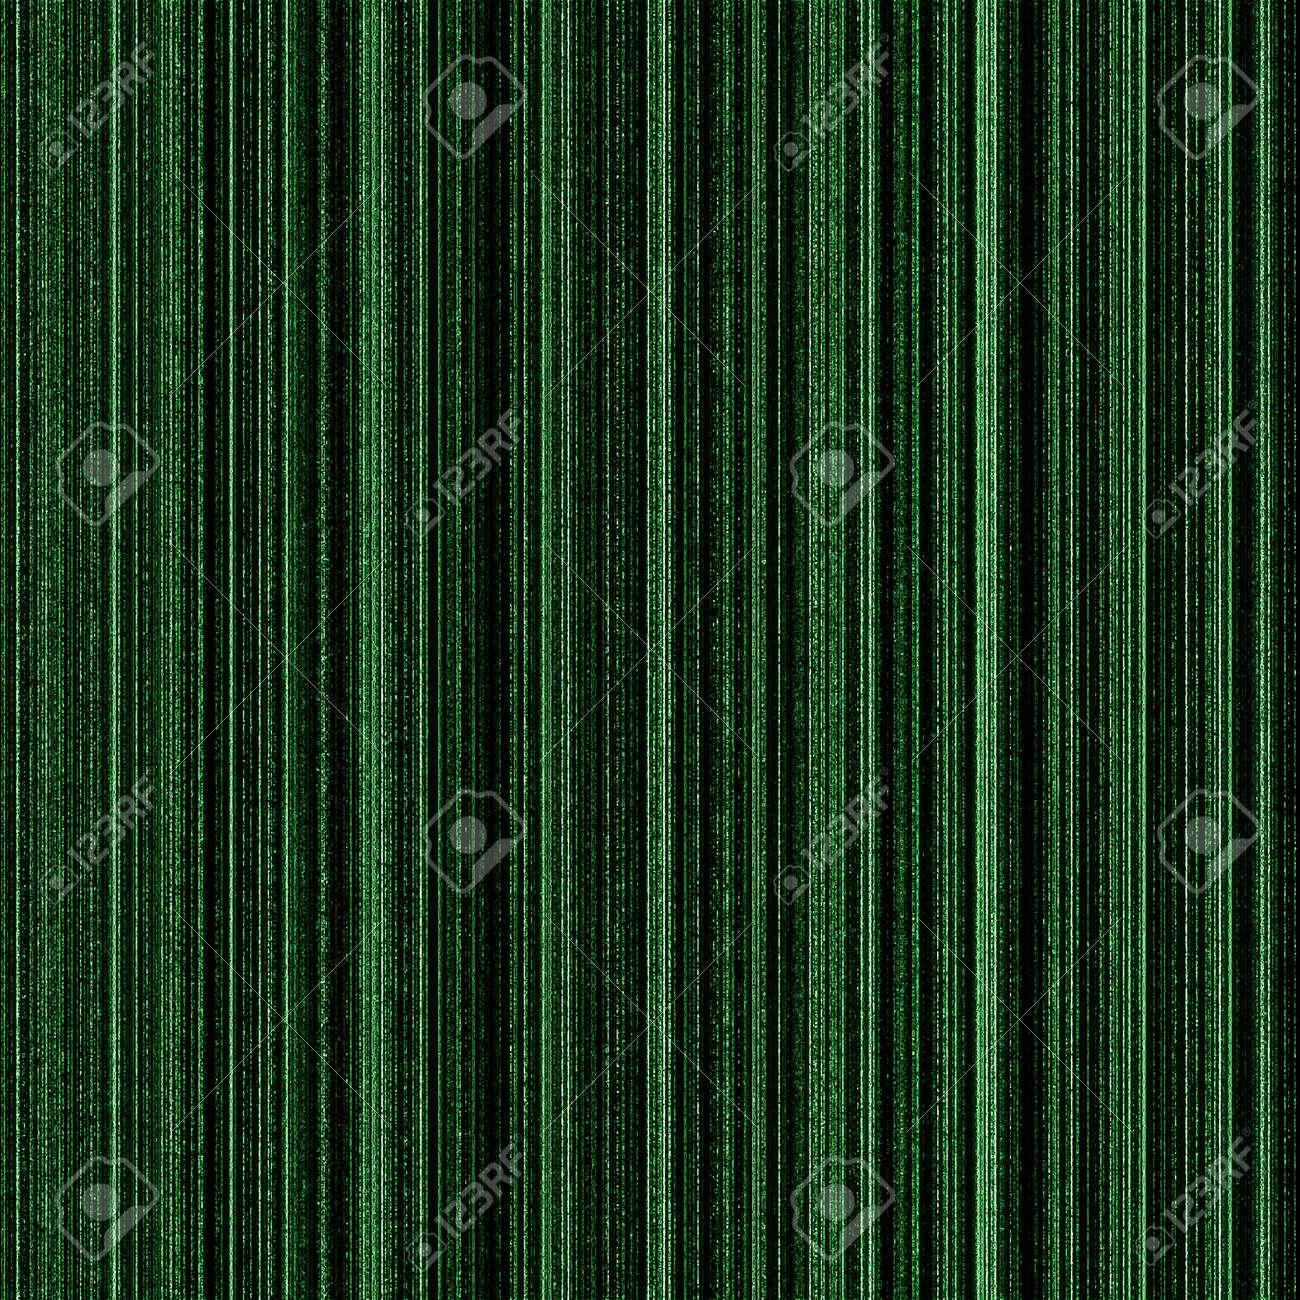 Matrix green background with neon green columns. Stock Photo - 5241430